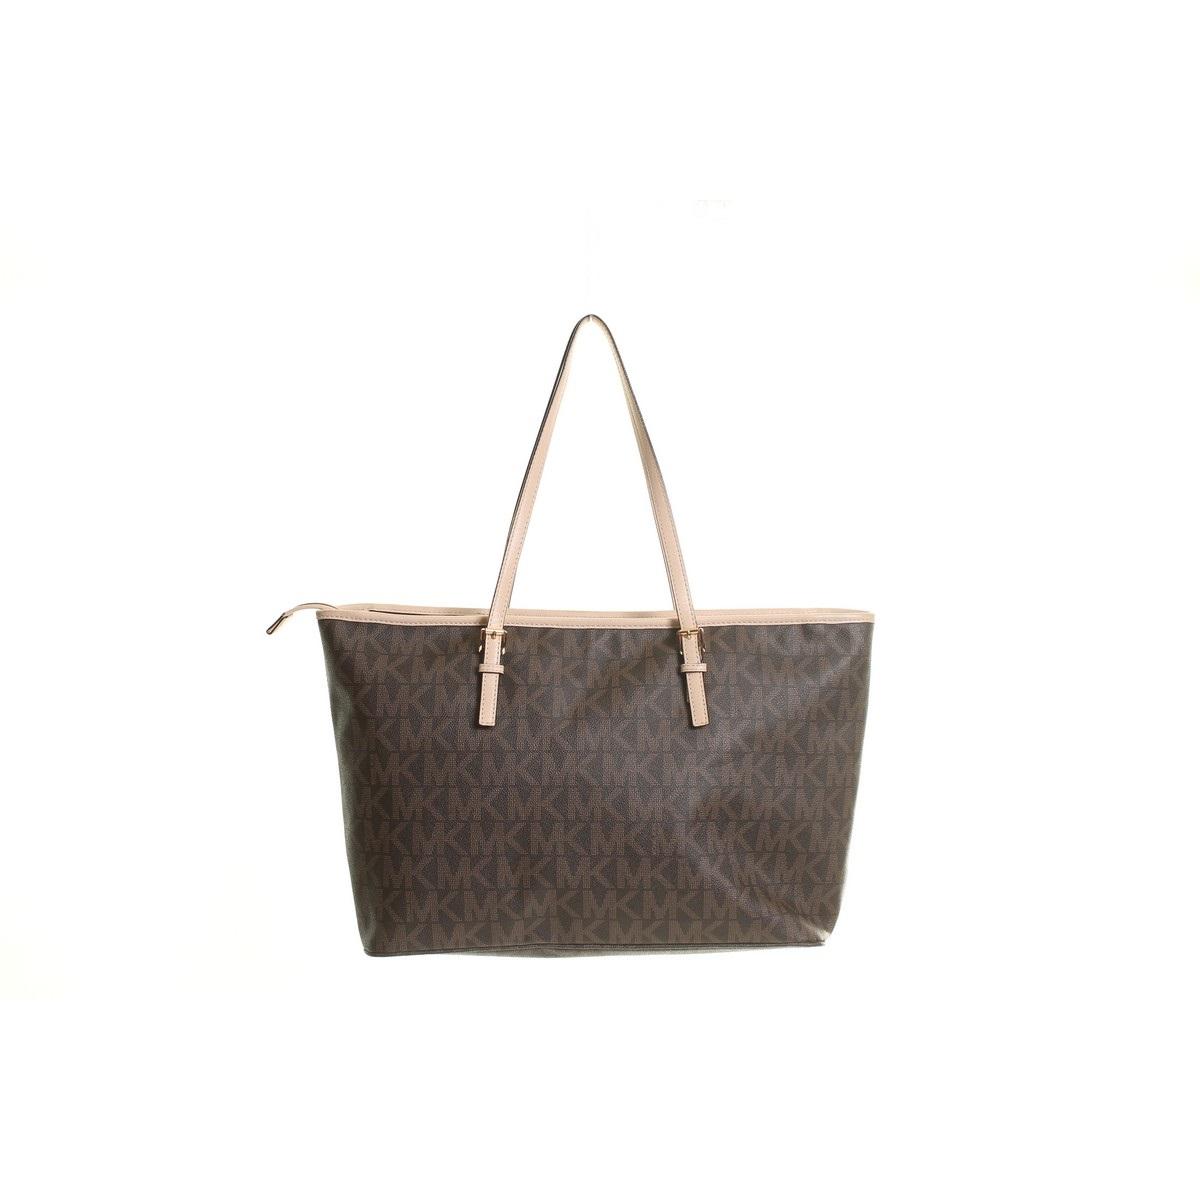 michael kors brown jet set travel signature logo tote handbag tedo ebay. Black Bedroom Furniture Sets. Home Design Ideas